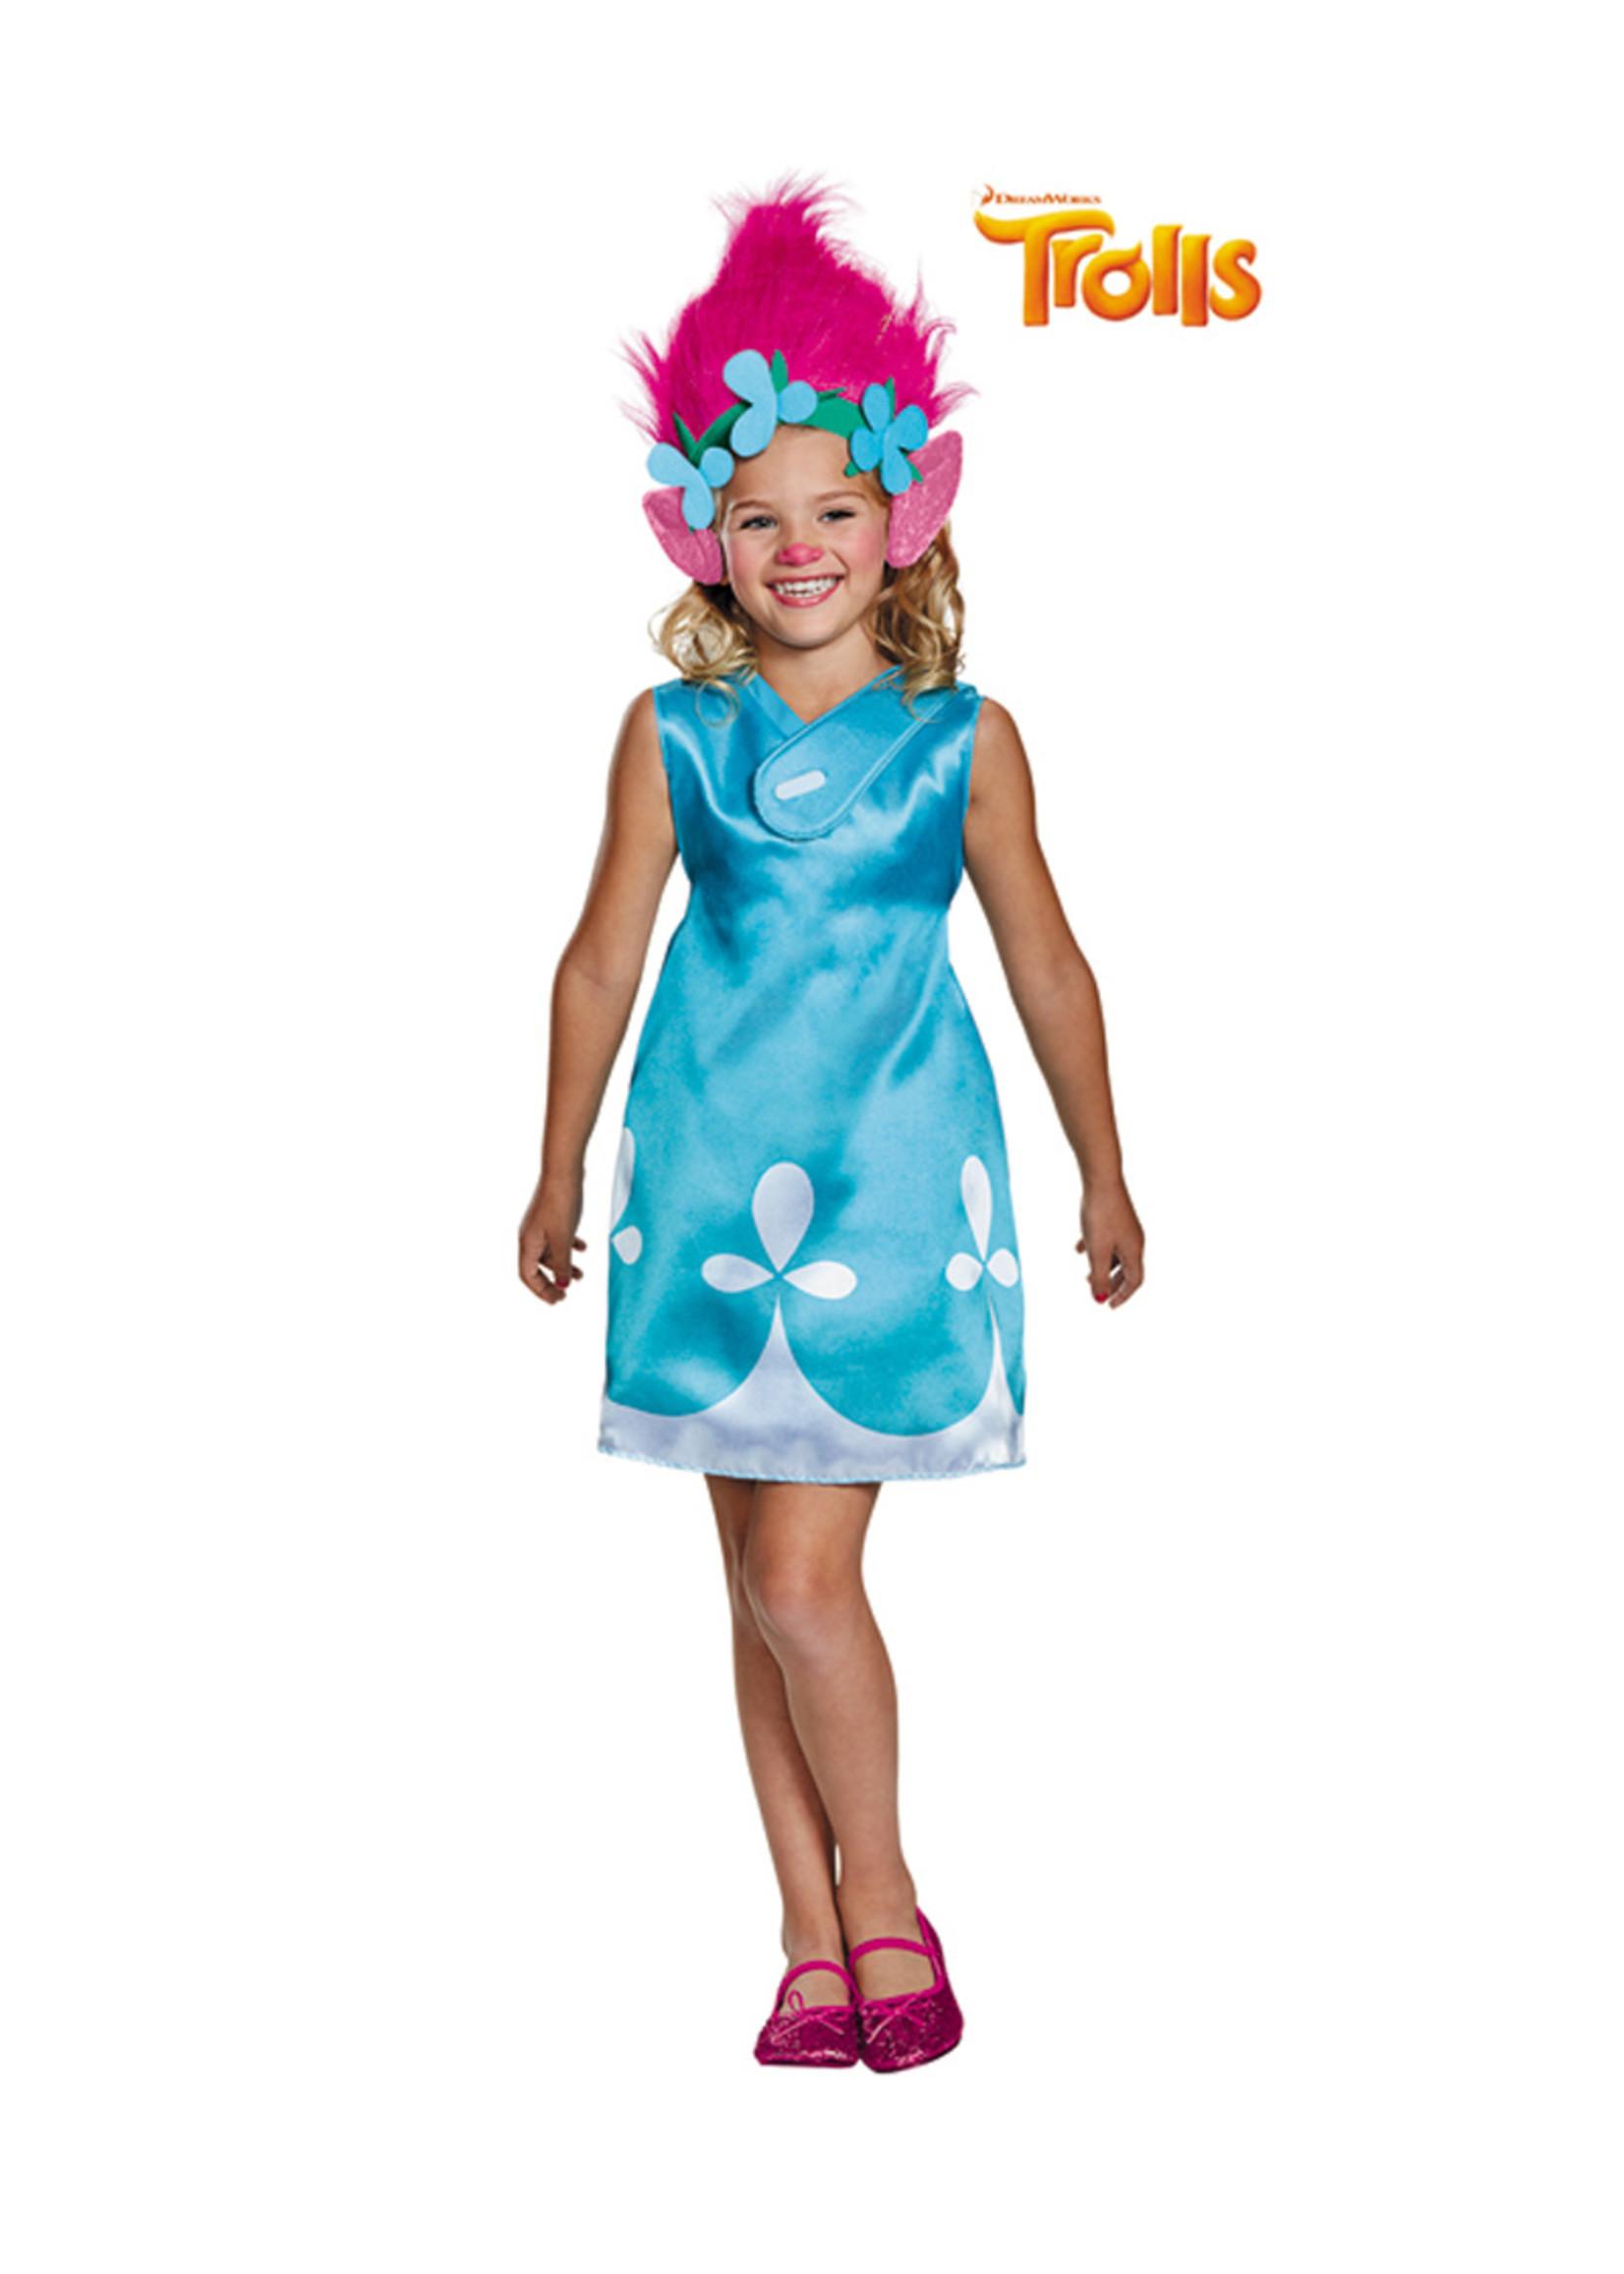 Poppy - Trolls Costume - Girls